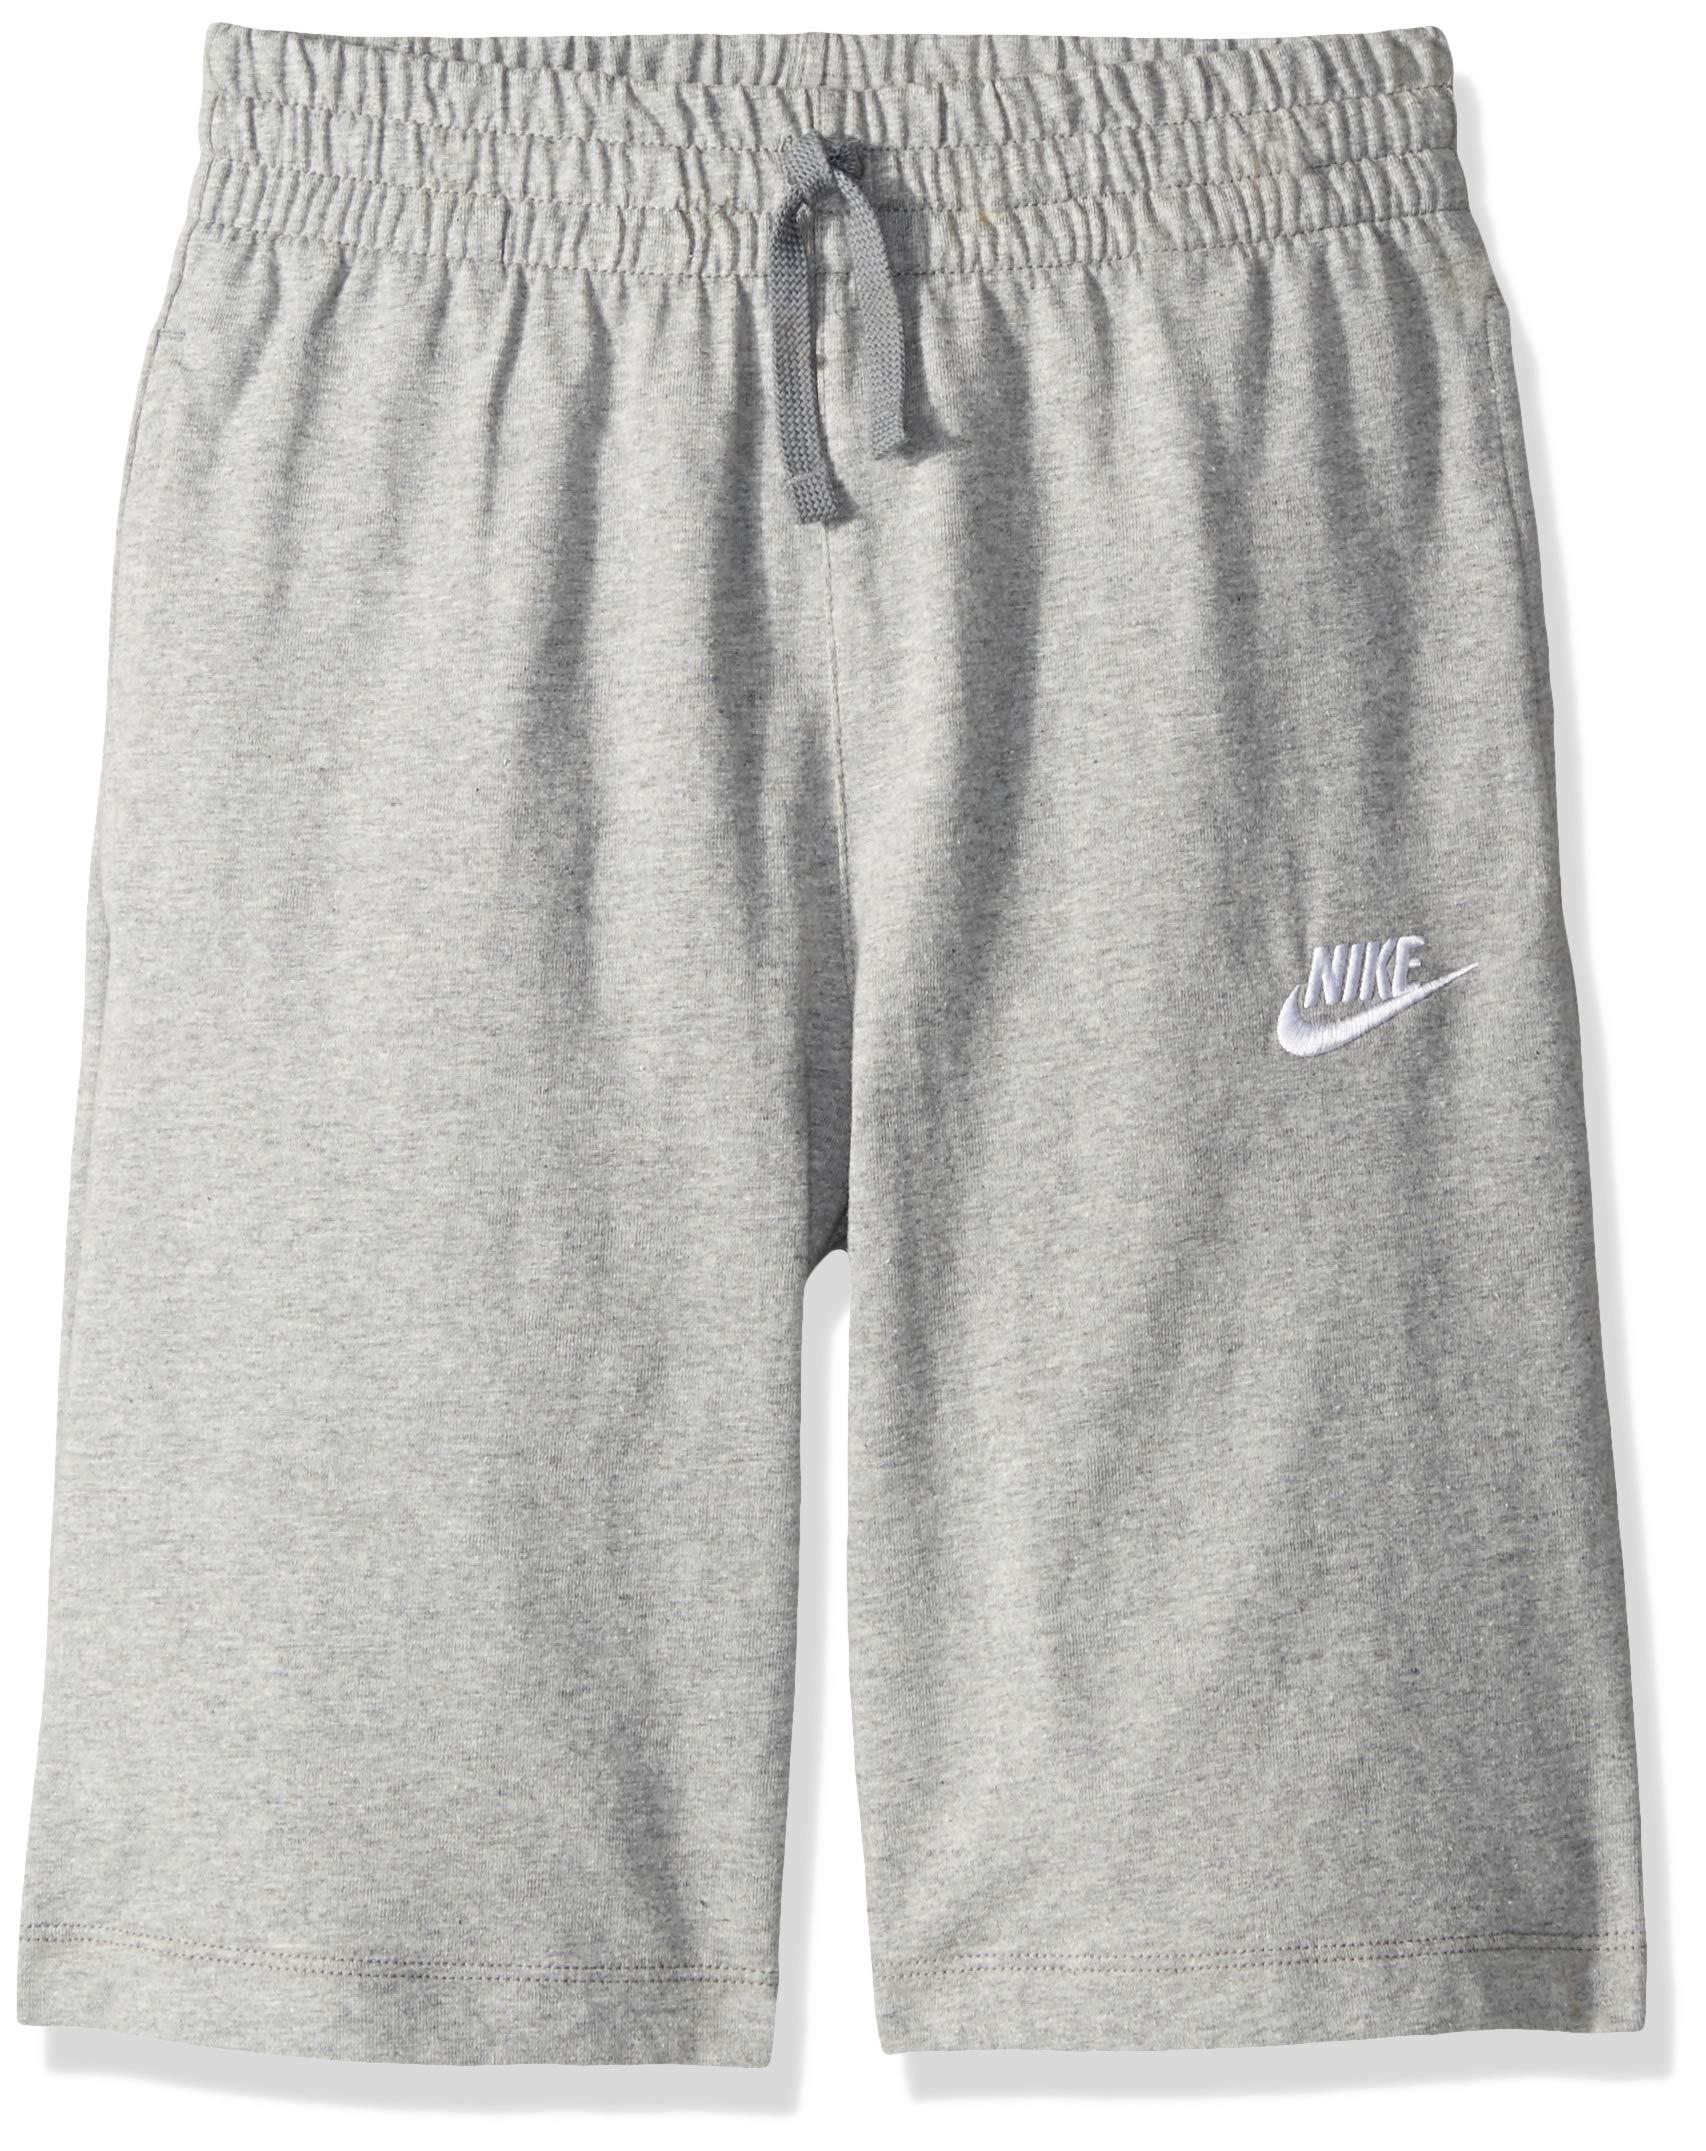 NIKE Sportswear Boys' Jersey Shorts, Dark Grey Heather/Dark Steel Grey/White, Large